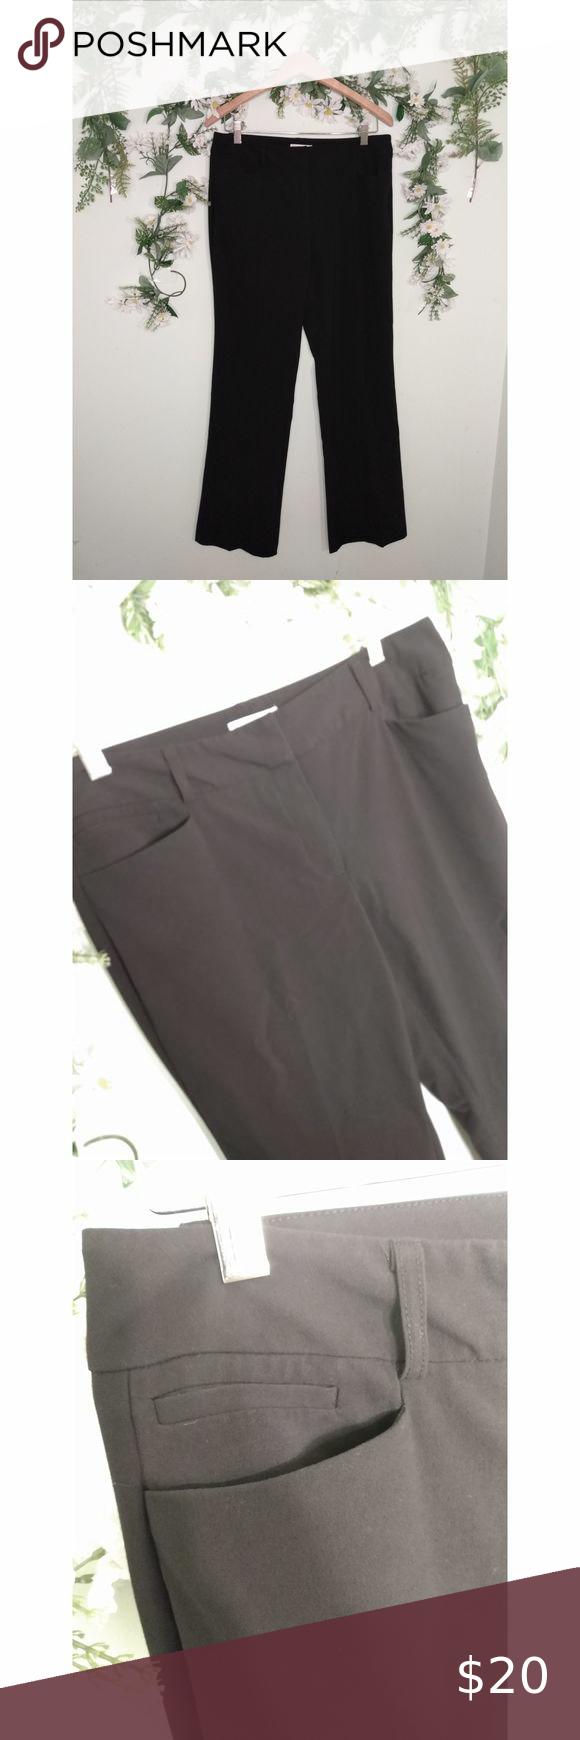 New York Company Black Dress Pants 8 Tall Black Dress Pants Dress Pants Black Dress [ 1740 x 580 Pixel ]